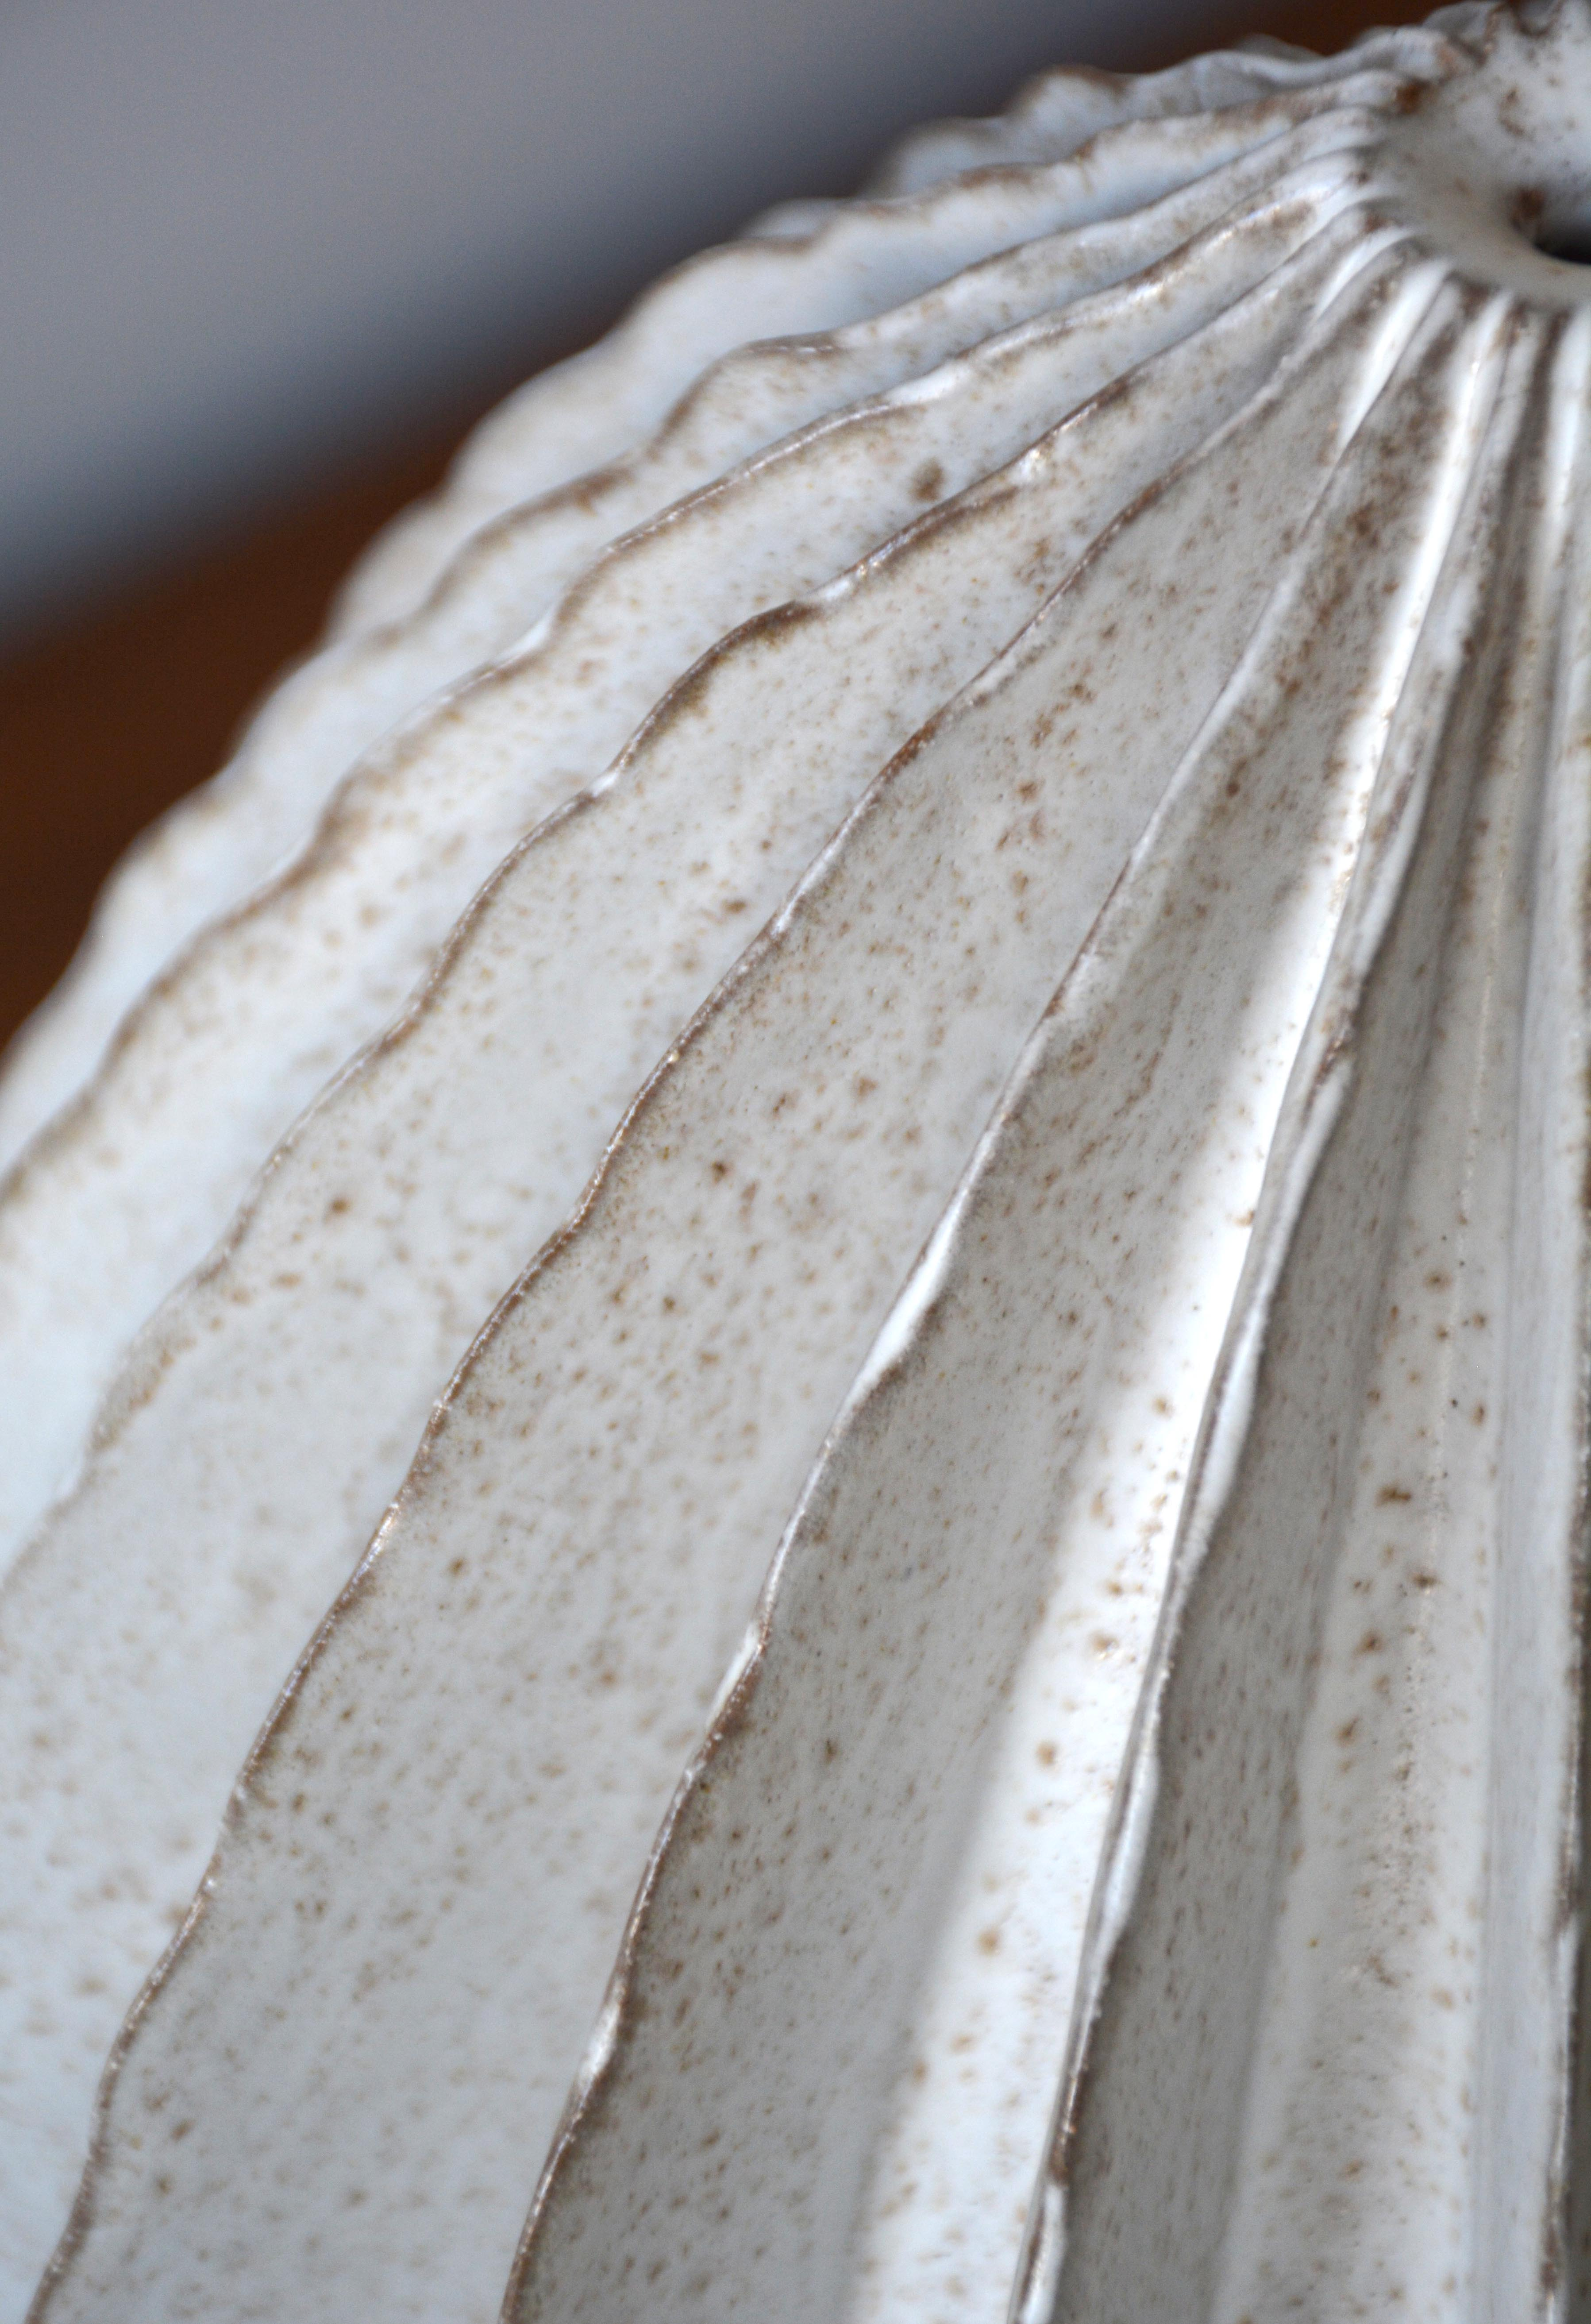 Shiitake White Pod Detail (2766)